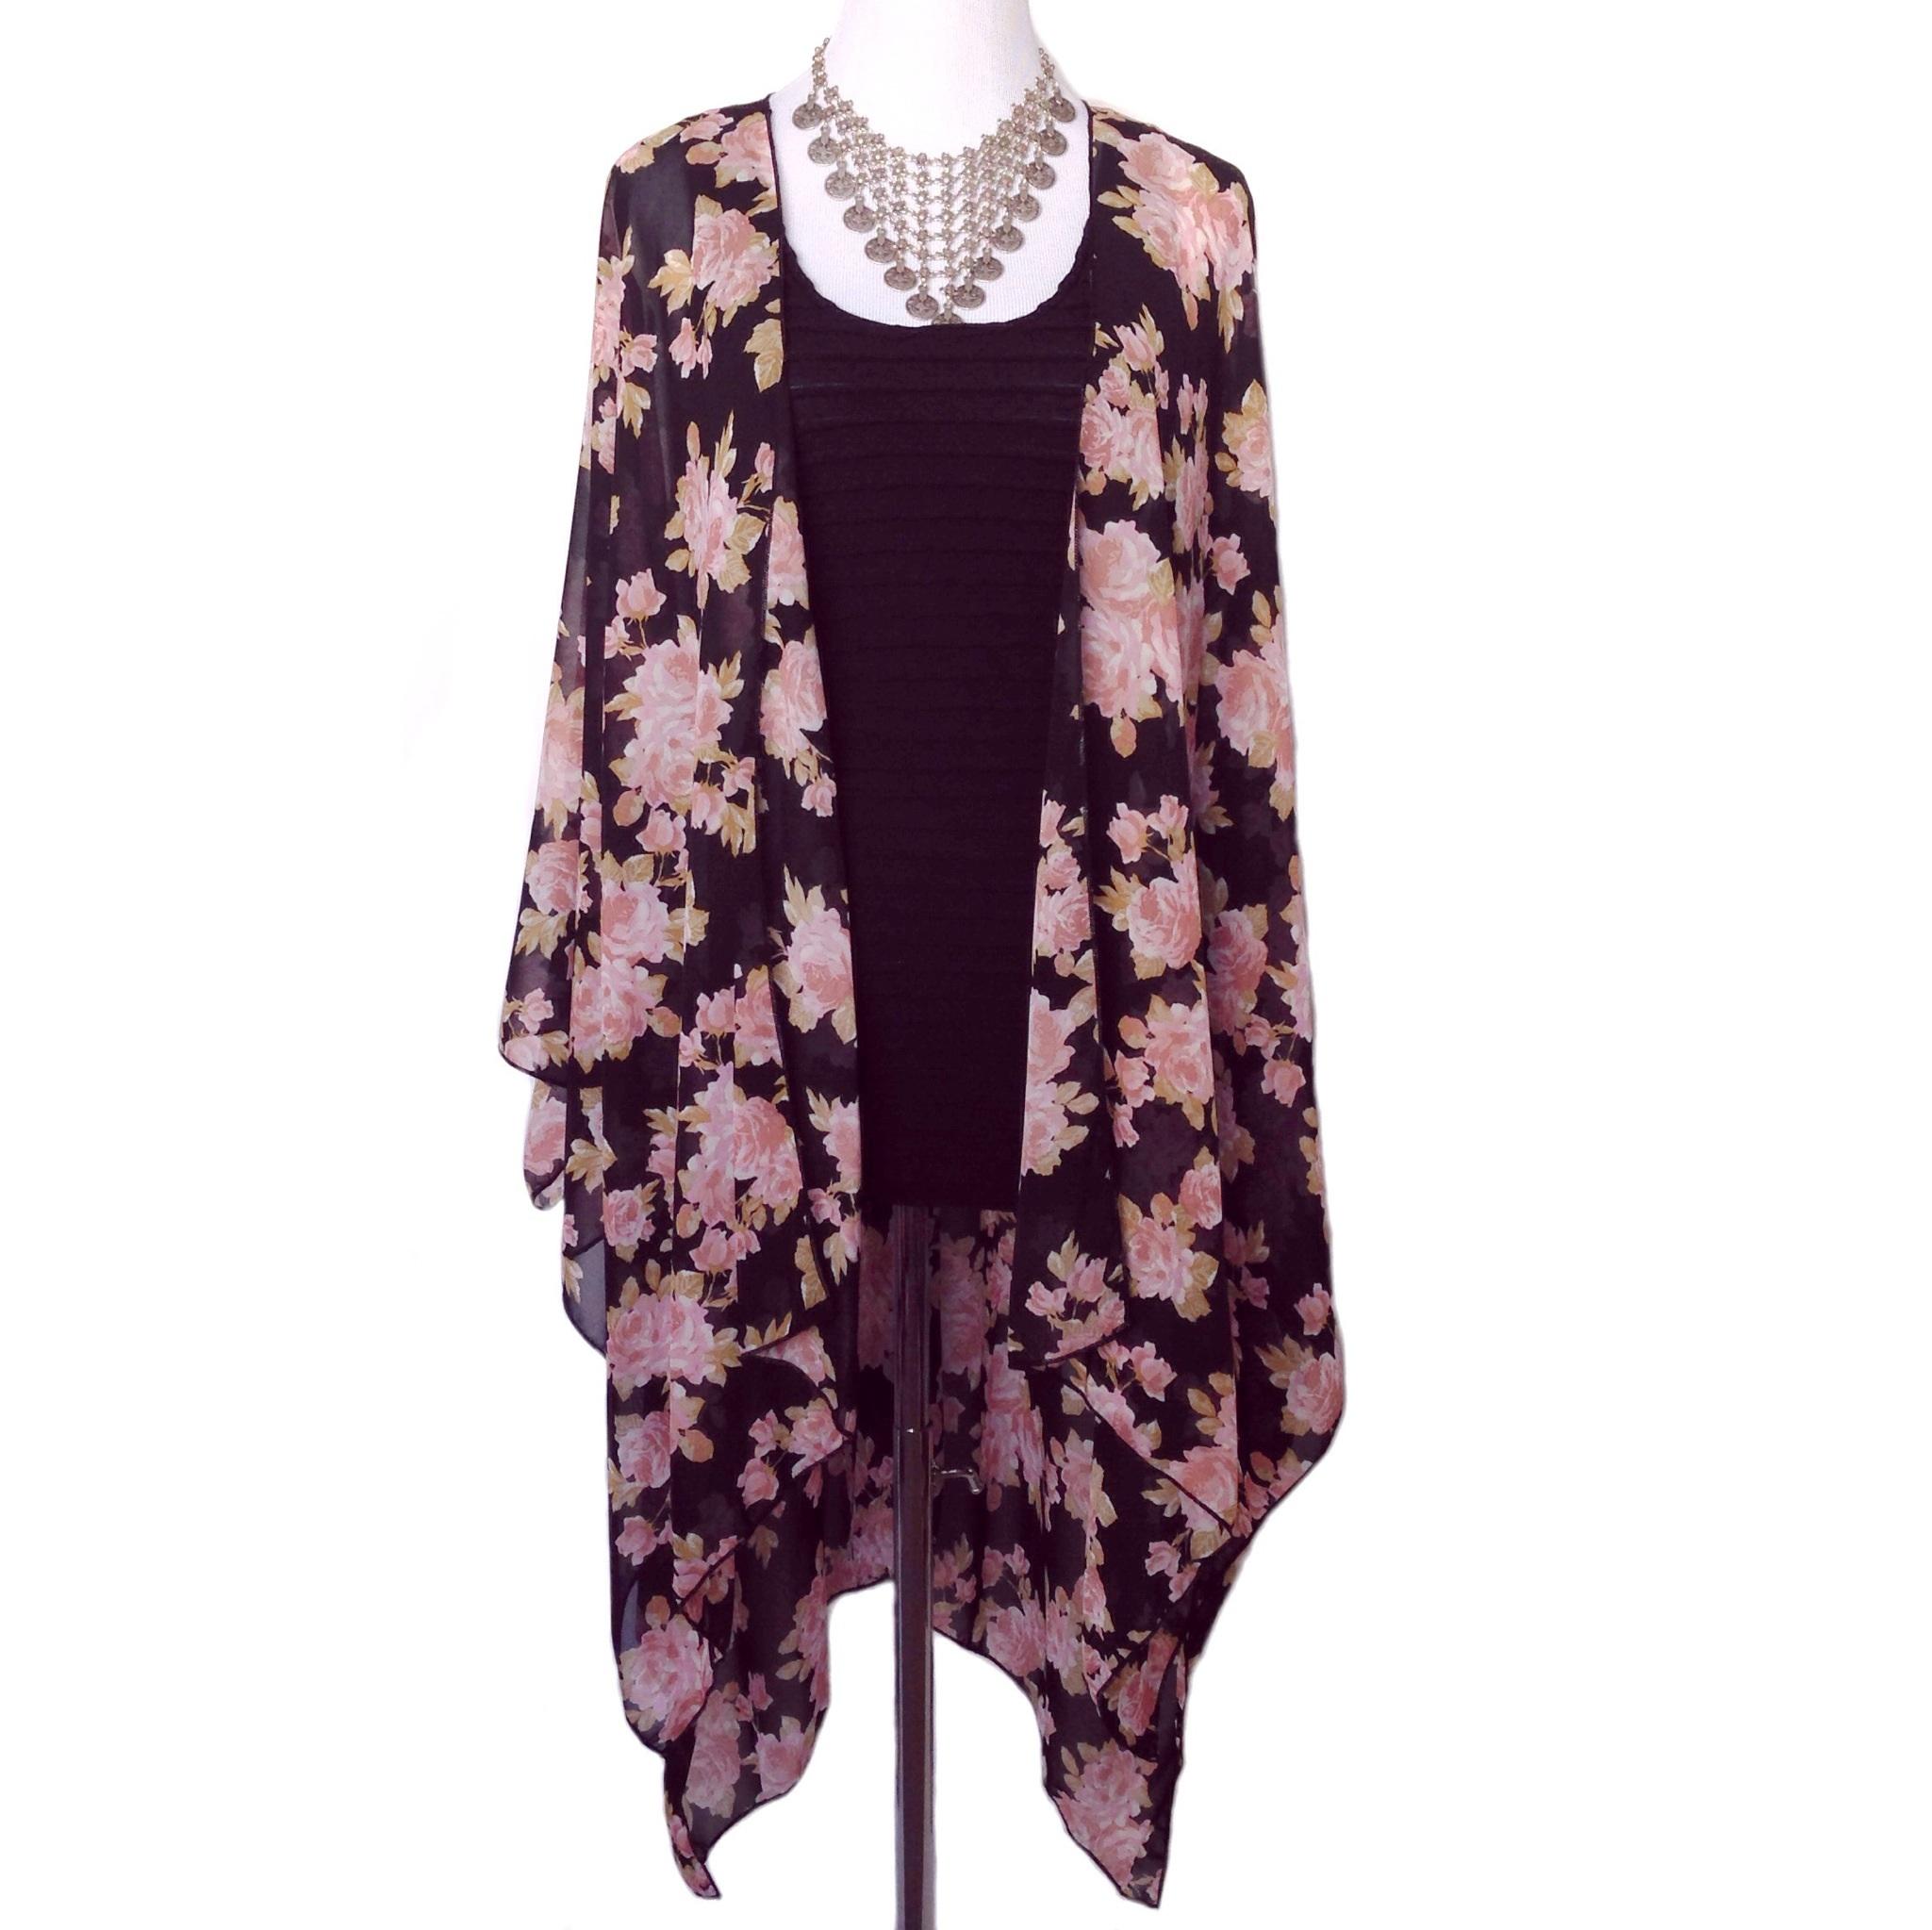 Rosey kimono